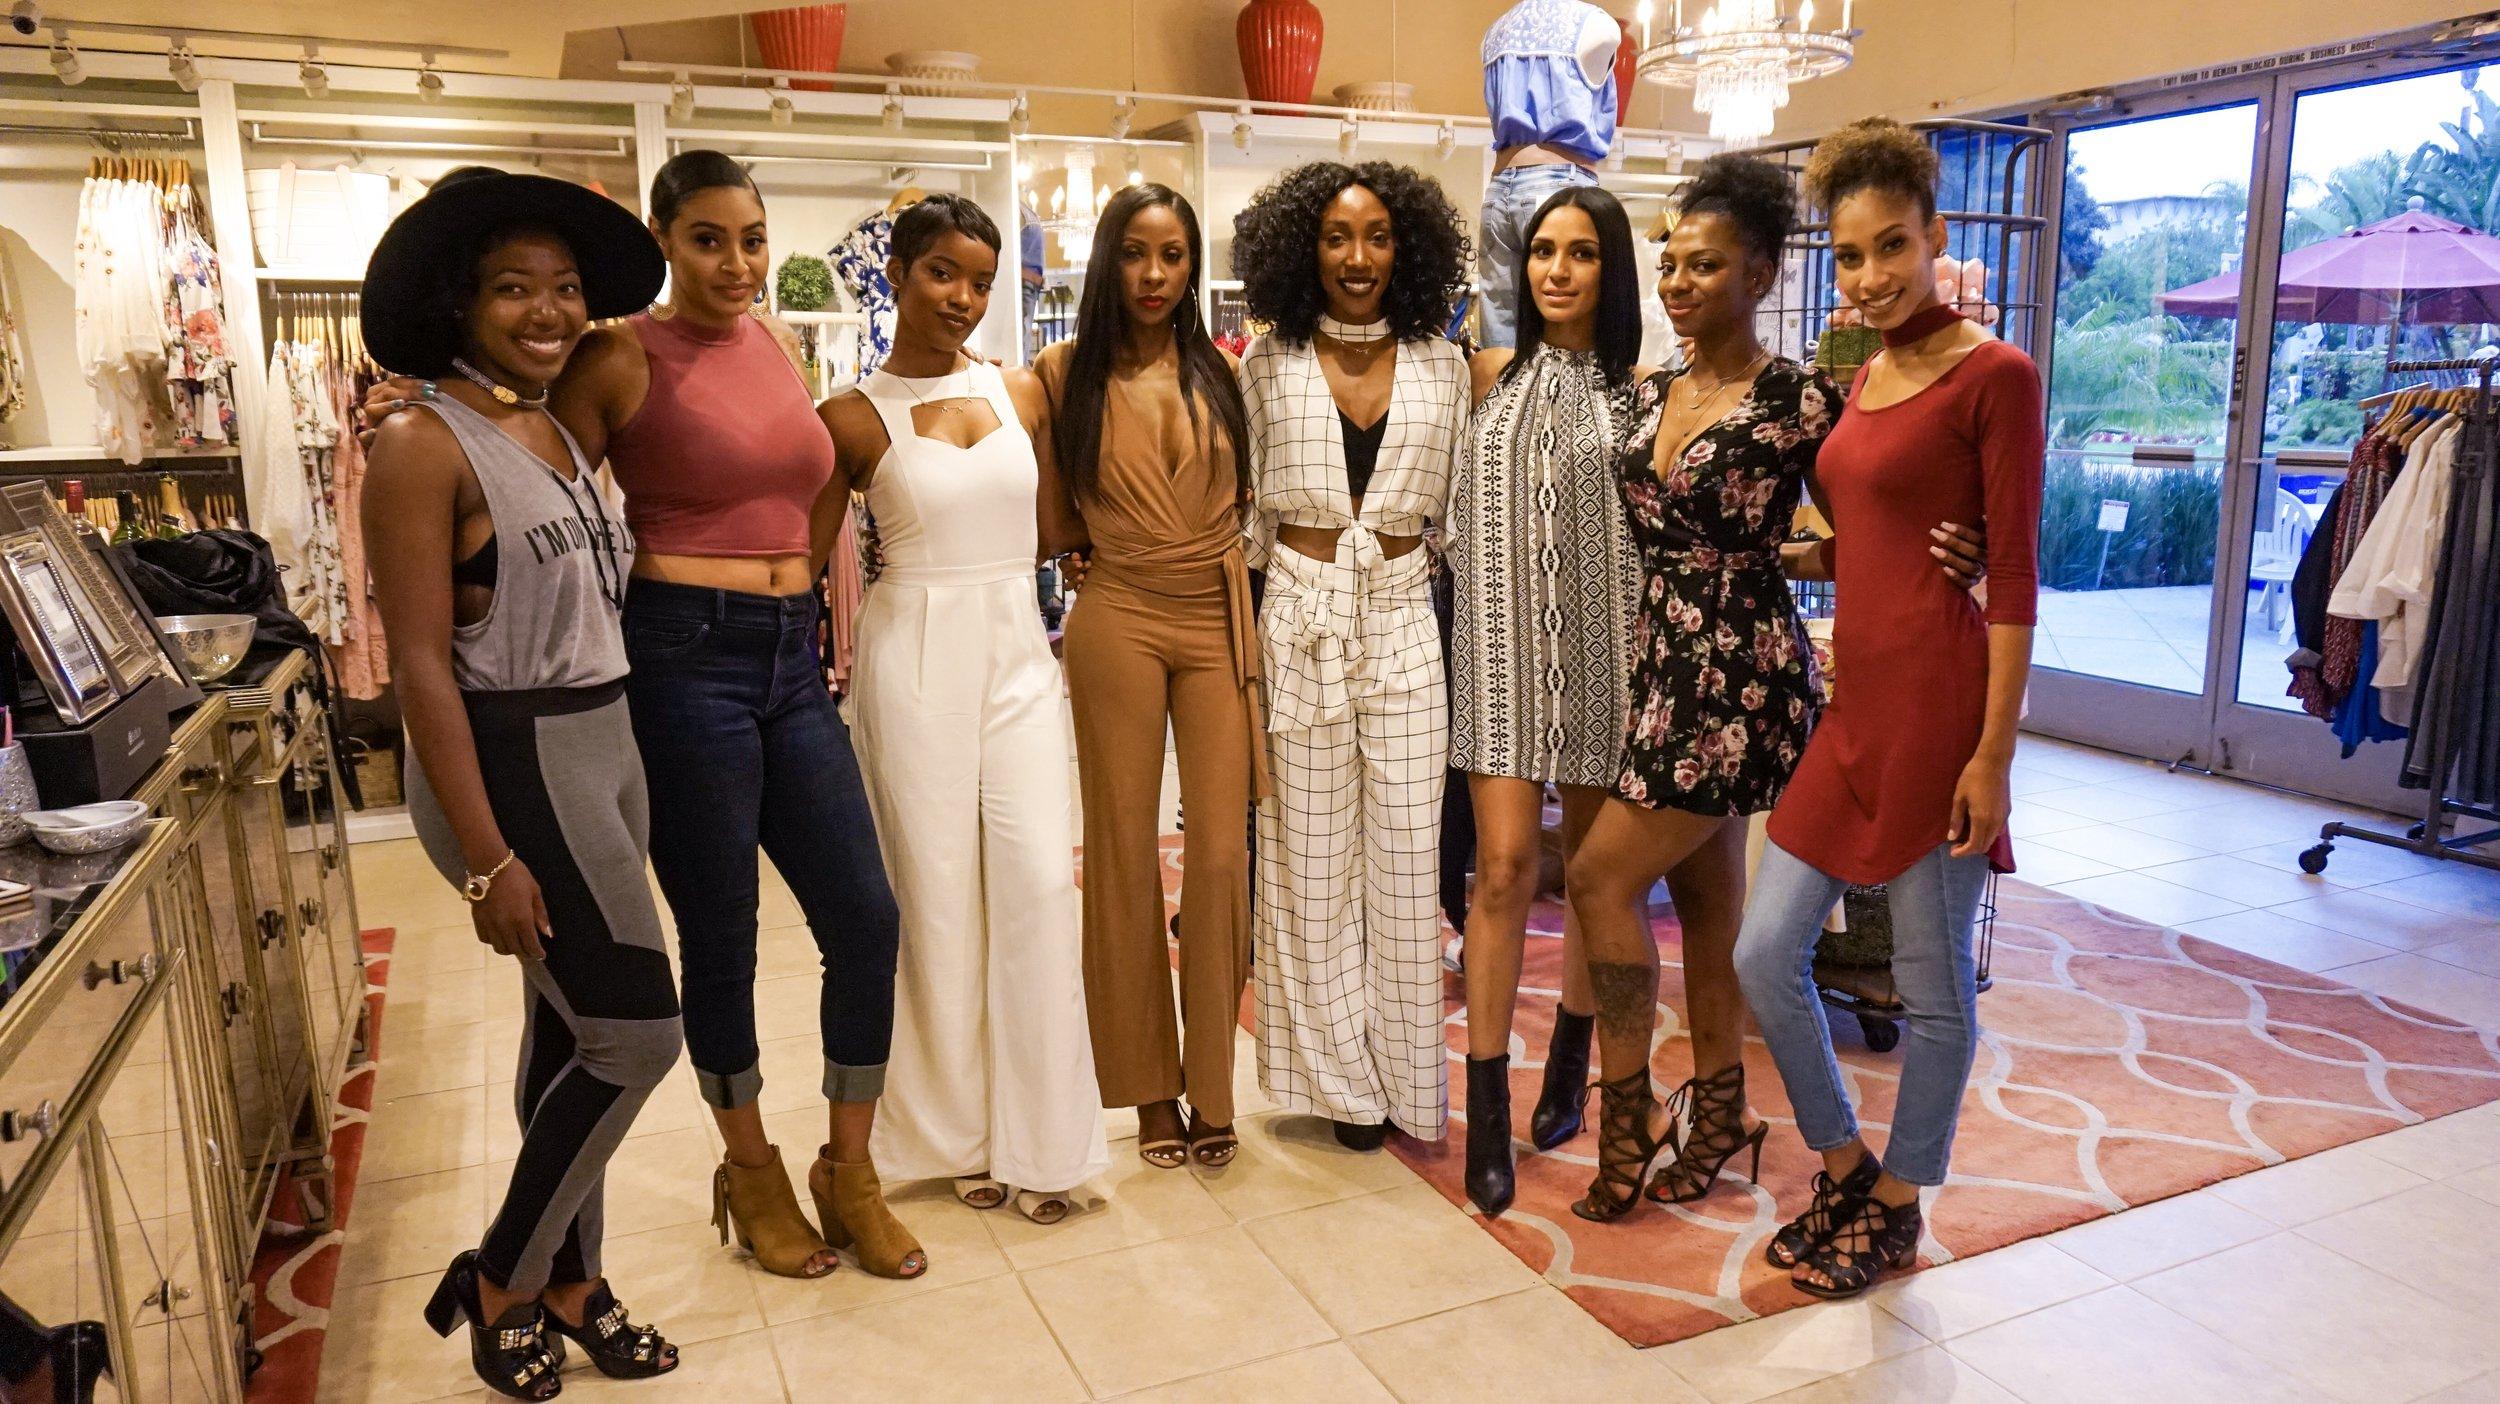 The girls!!!!!  Follow My friends...  -Kennesha @the_kennesha  - Pashana  @pashanadotcom <----Check out her blog!!!! -Jazzie @jazziewillmake1  -Christina @taj_ambar <----- Designer!!! Go check out here work!! - Alexis  @alexis_kalon <----Book her for makeup!!!! - Maura  @makeupbymaura <----Book her for makeup!!! -Amara @amara_carey